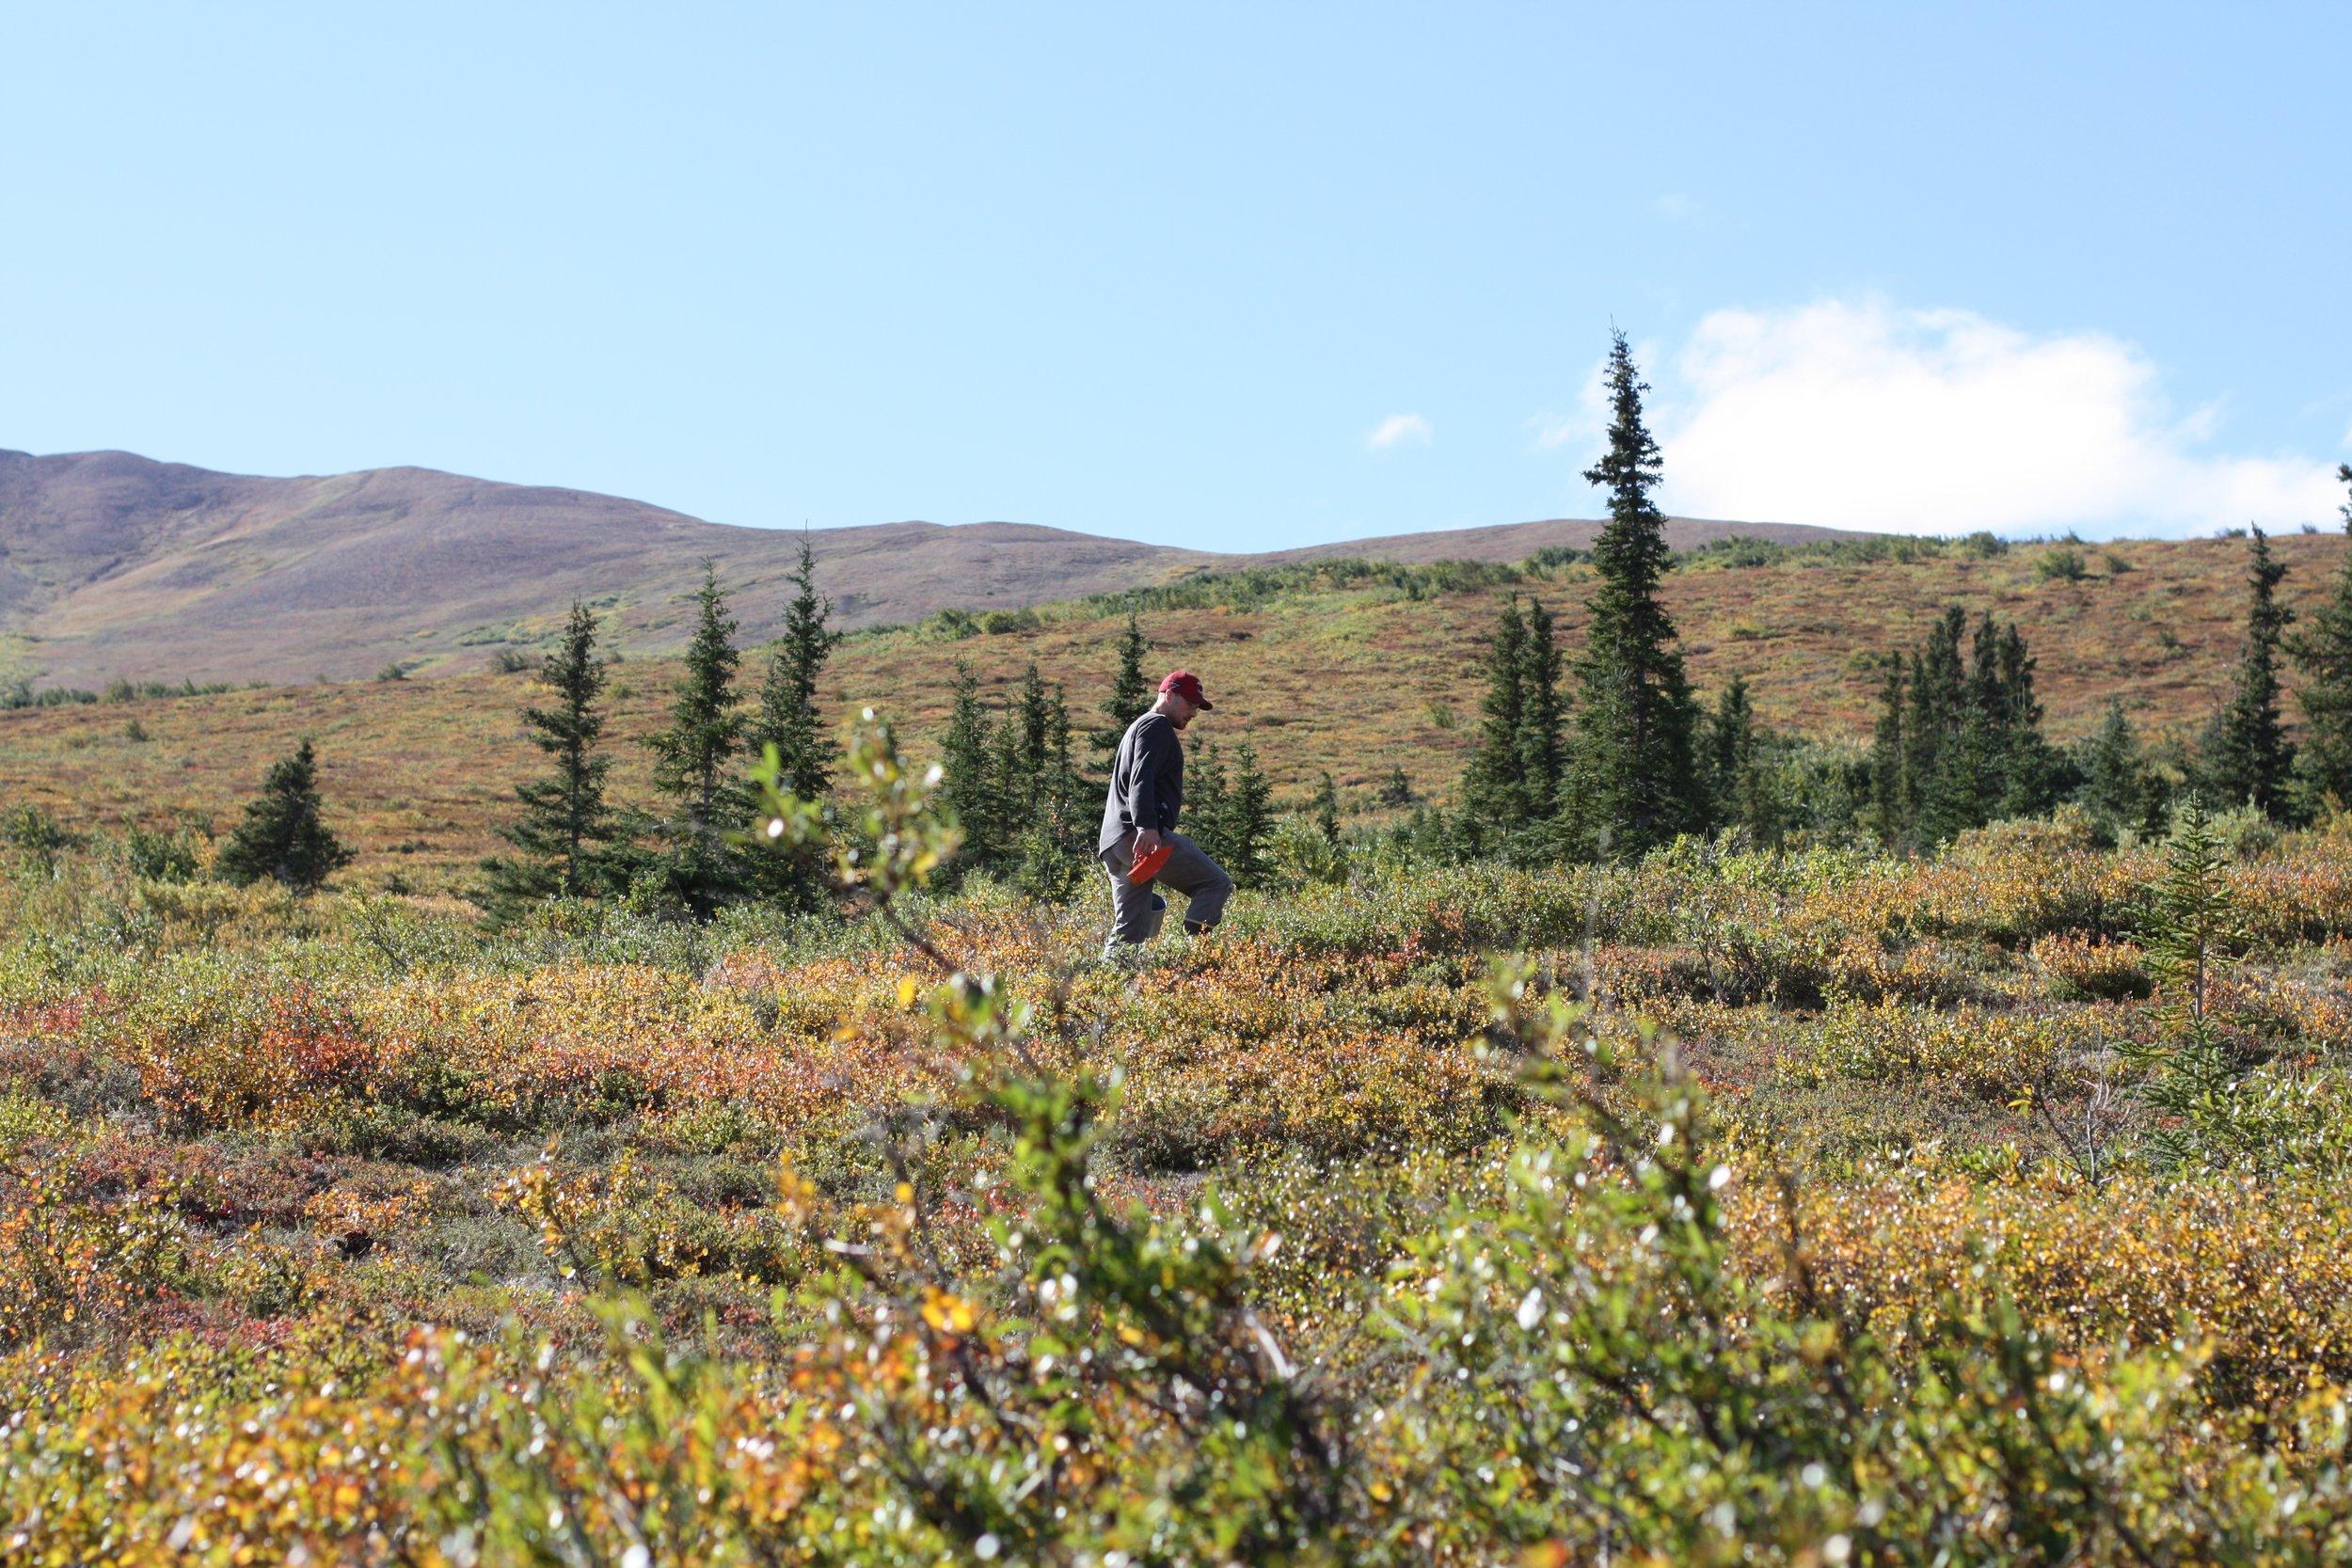 Berry picking 14 Mile Farm Handweaving and Homesteading in Alaska